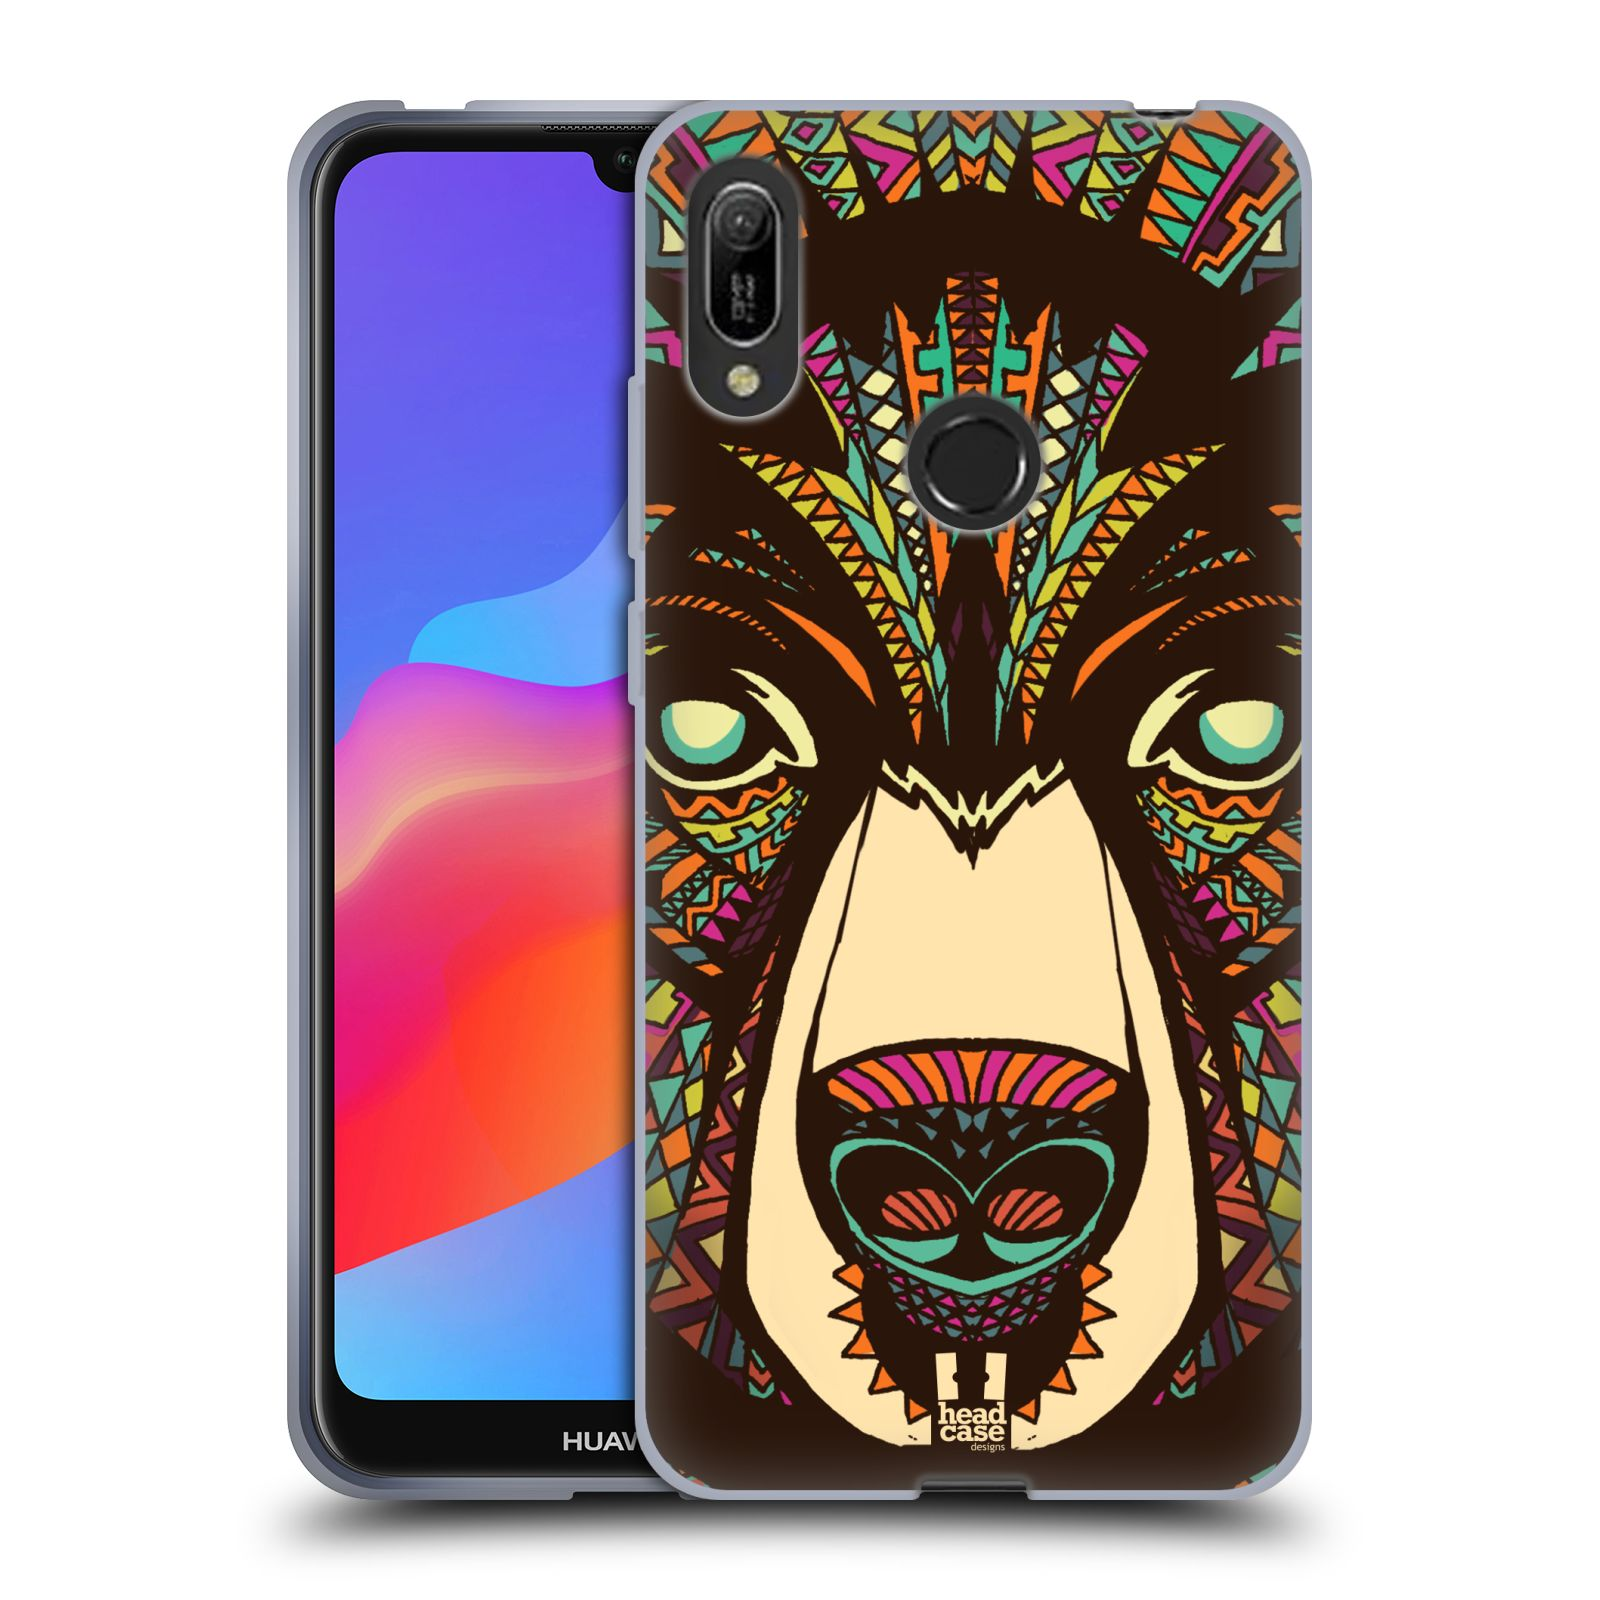 Silikonové pouzdro na mobil Huawei Y6 (2019) - Head Case - AZTEC MEDVĚD